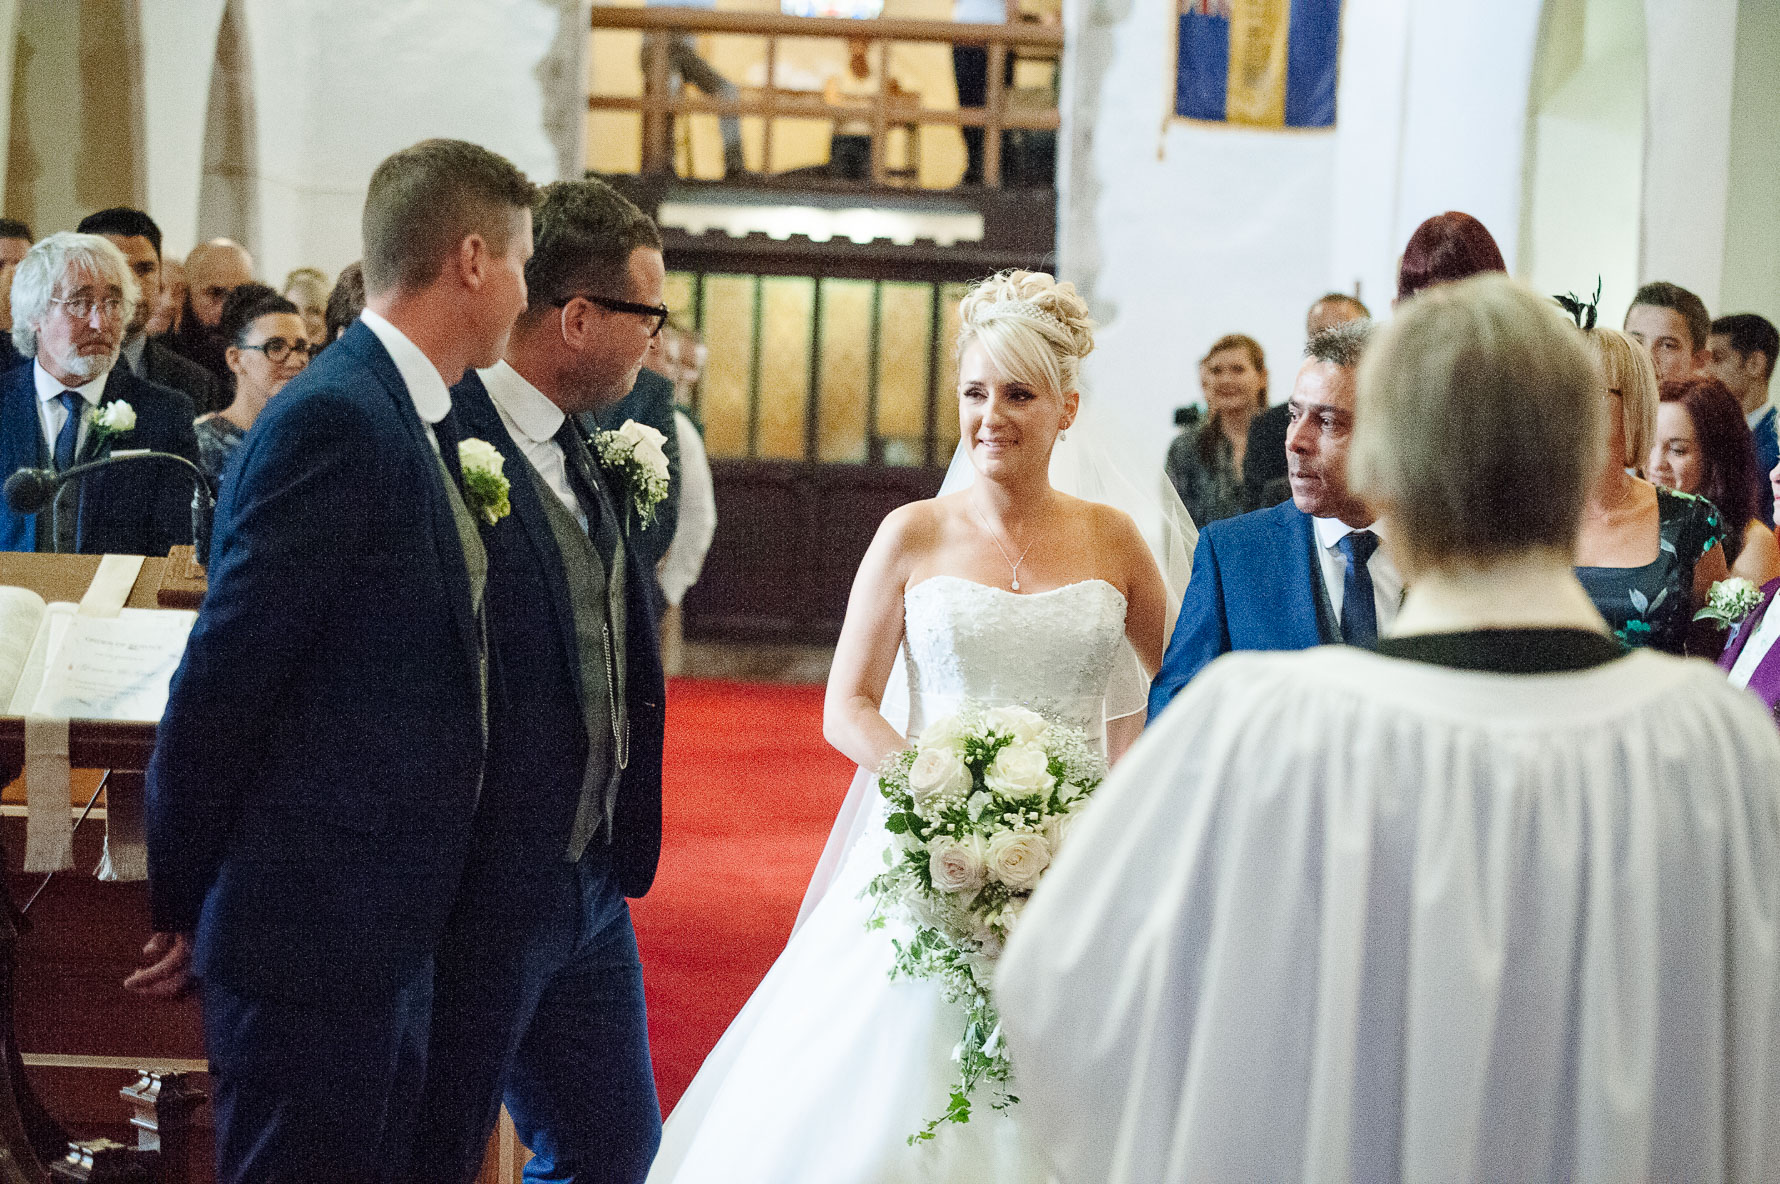 Canterbury Cathedral Lodge Wedding22-20141004 0418